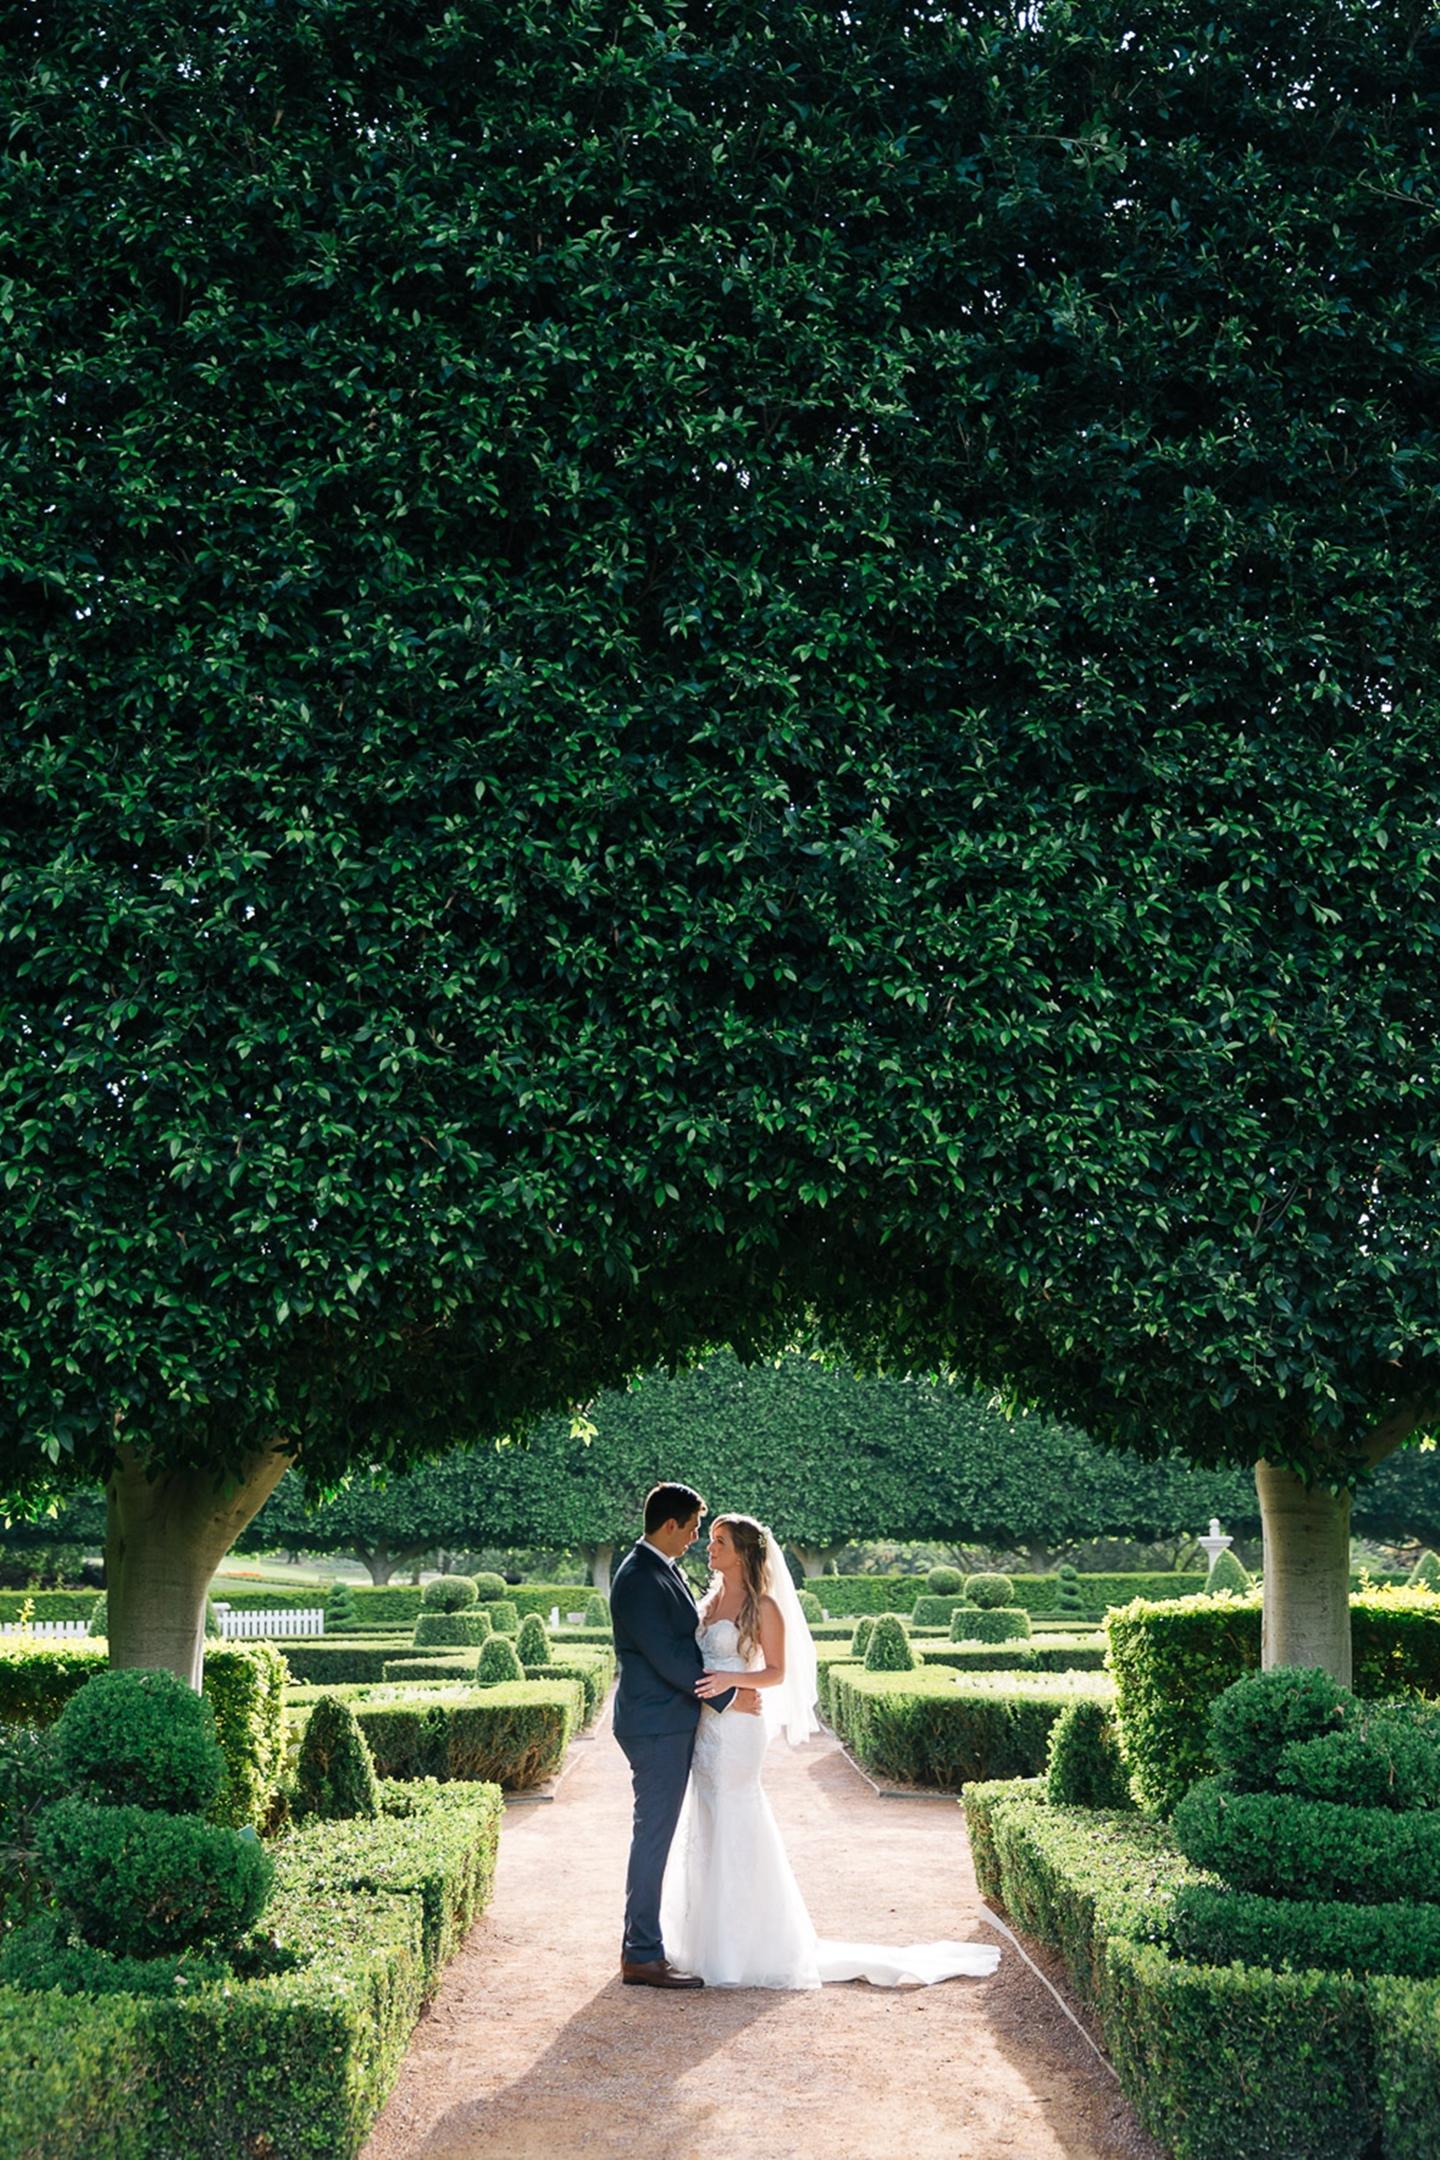 Aliesha & Jonathan_wedding photos_web quality_-360.jpg